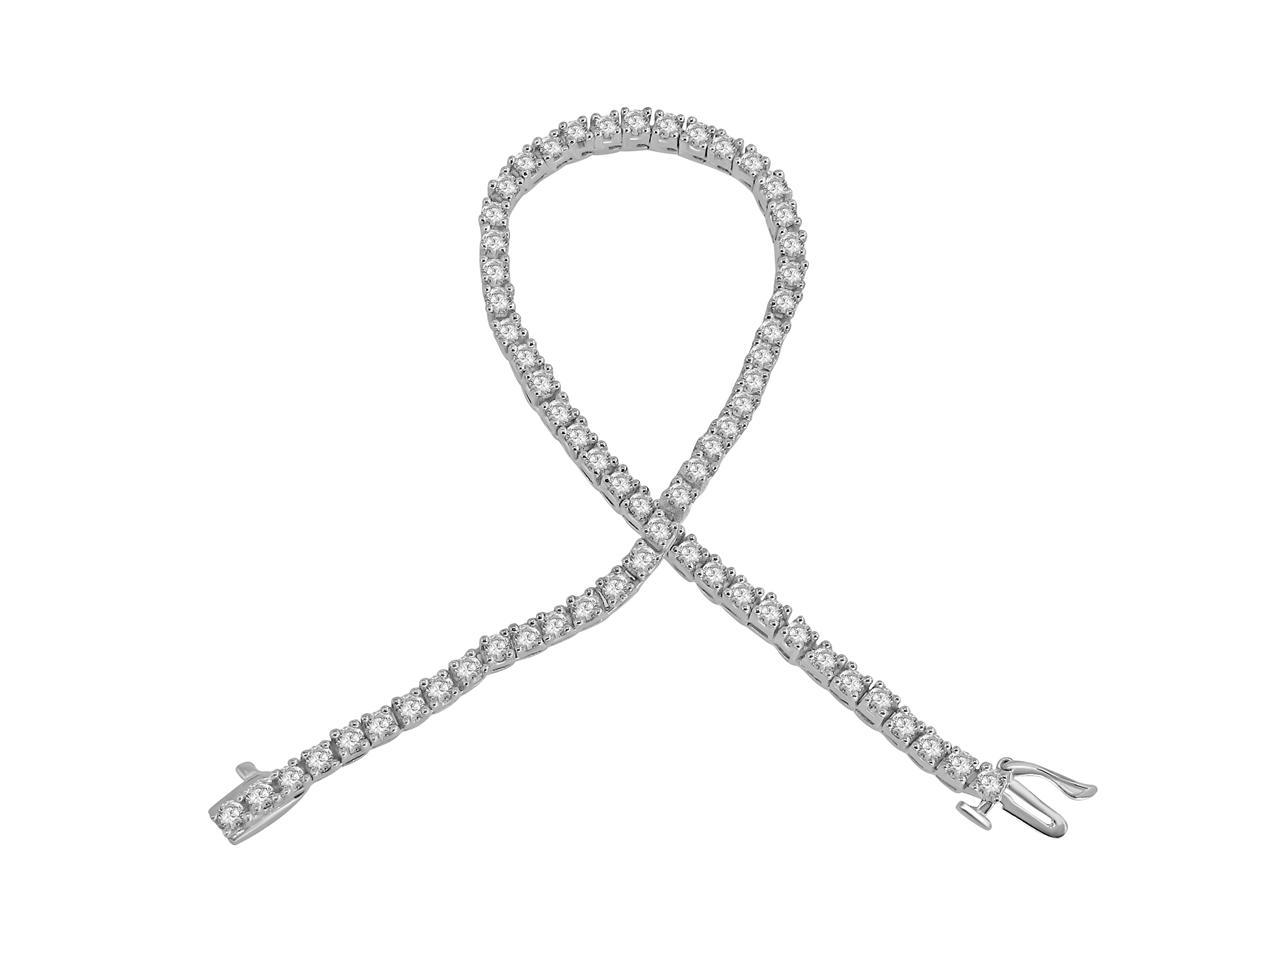 Si1 G 3 10 Ct Round Cut Diamond Tennis Bracelet 14k Solid